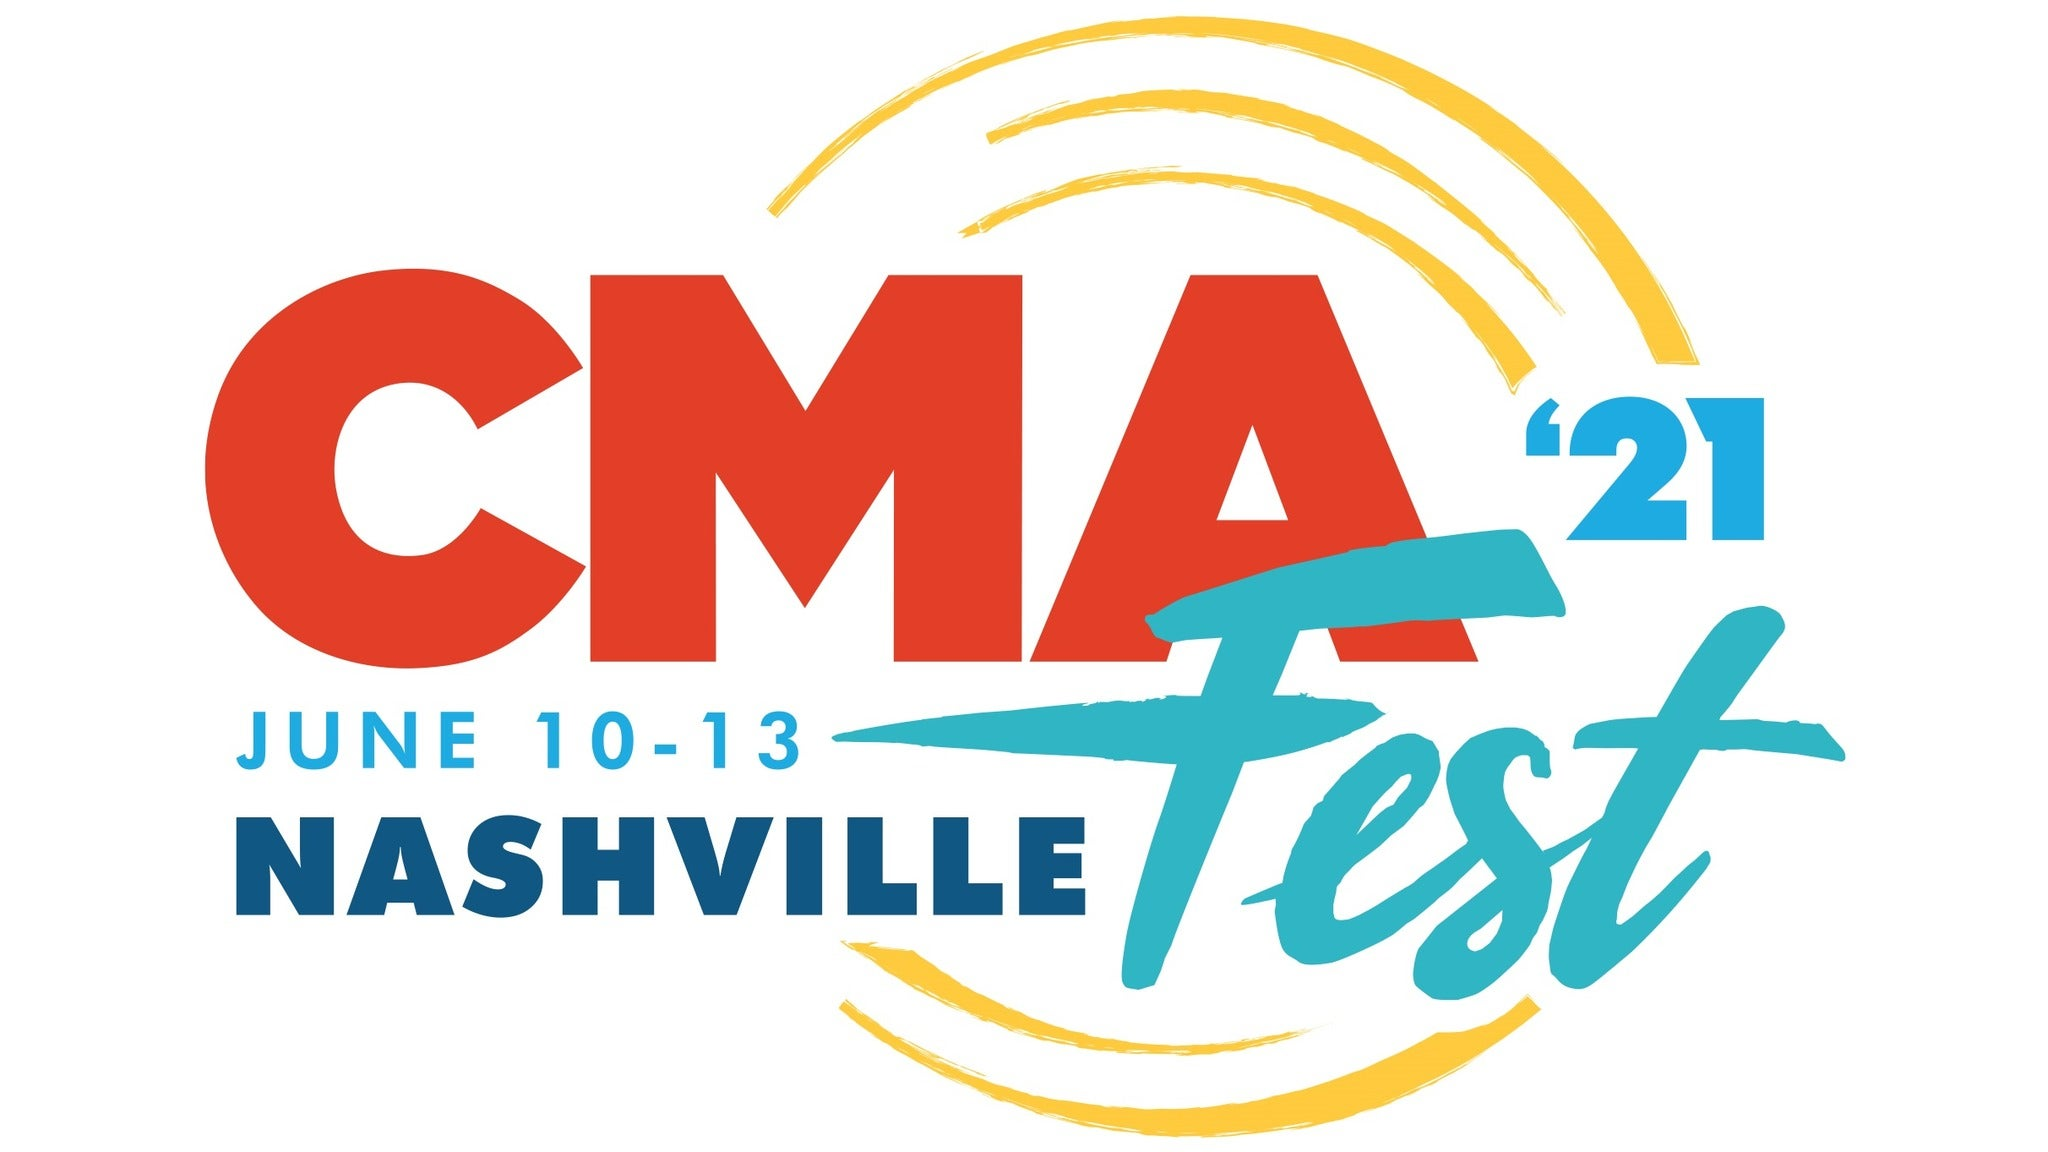 2021 CMA Fest